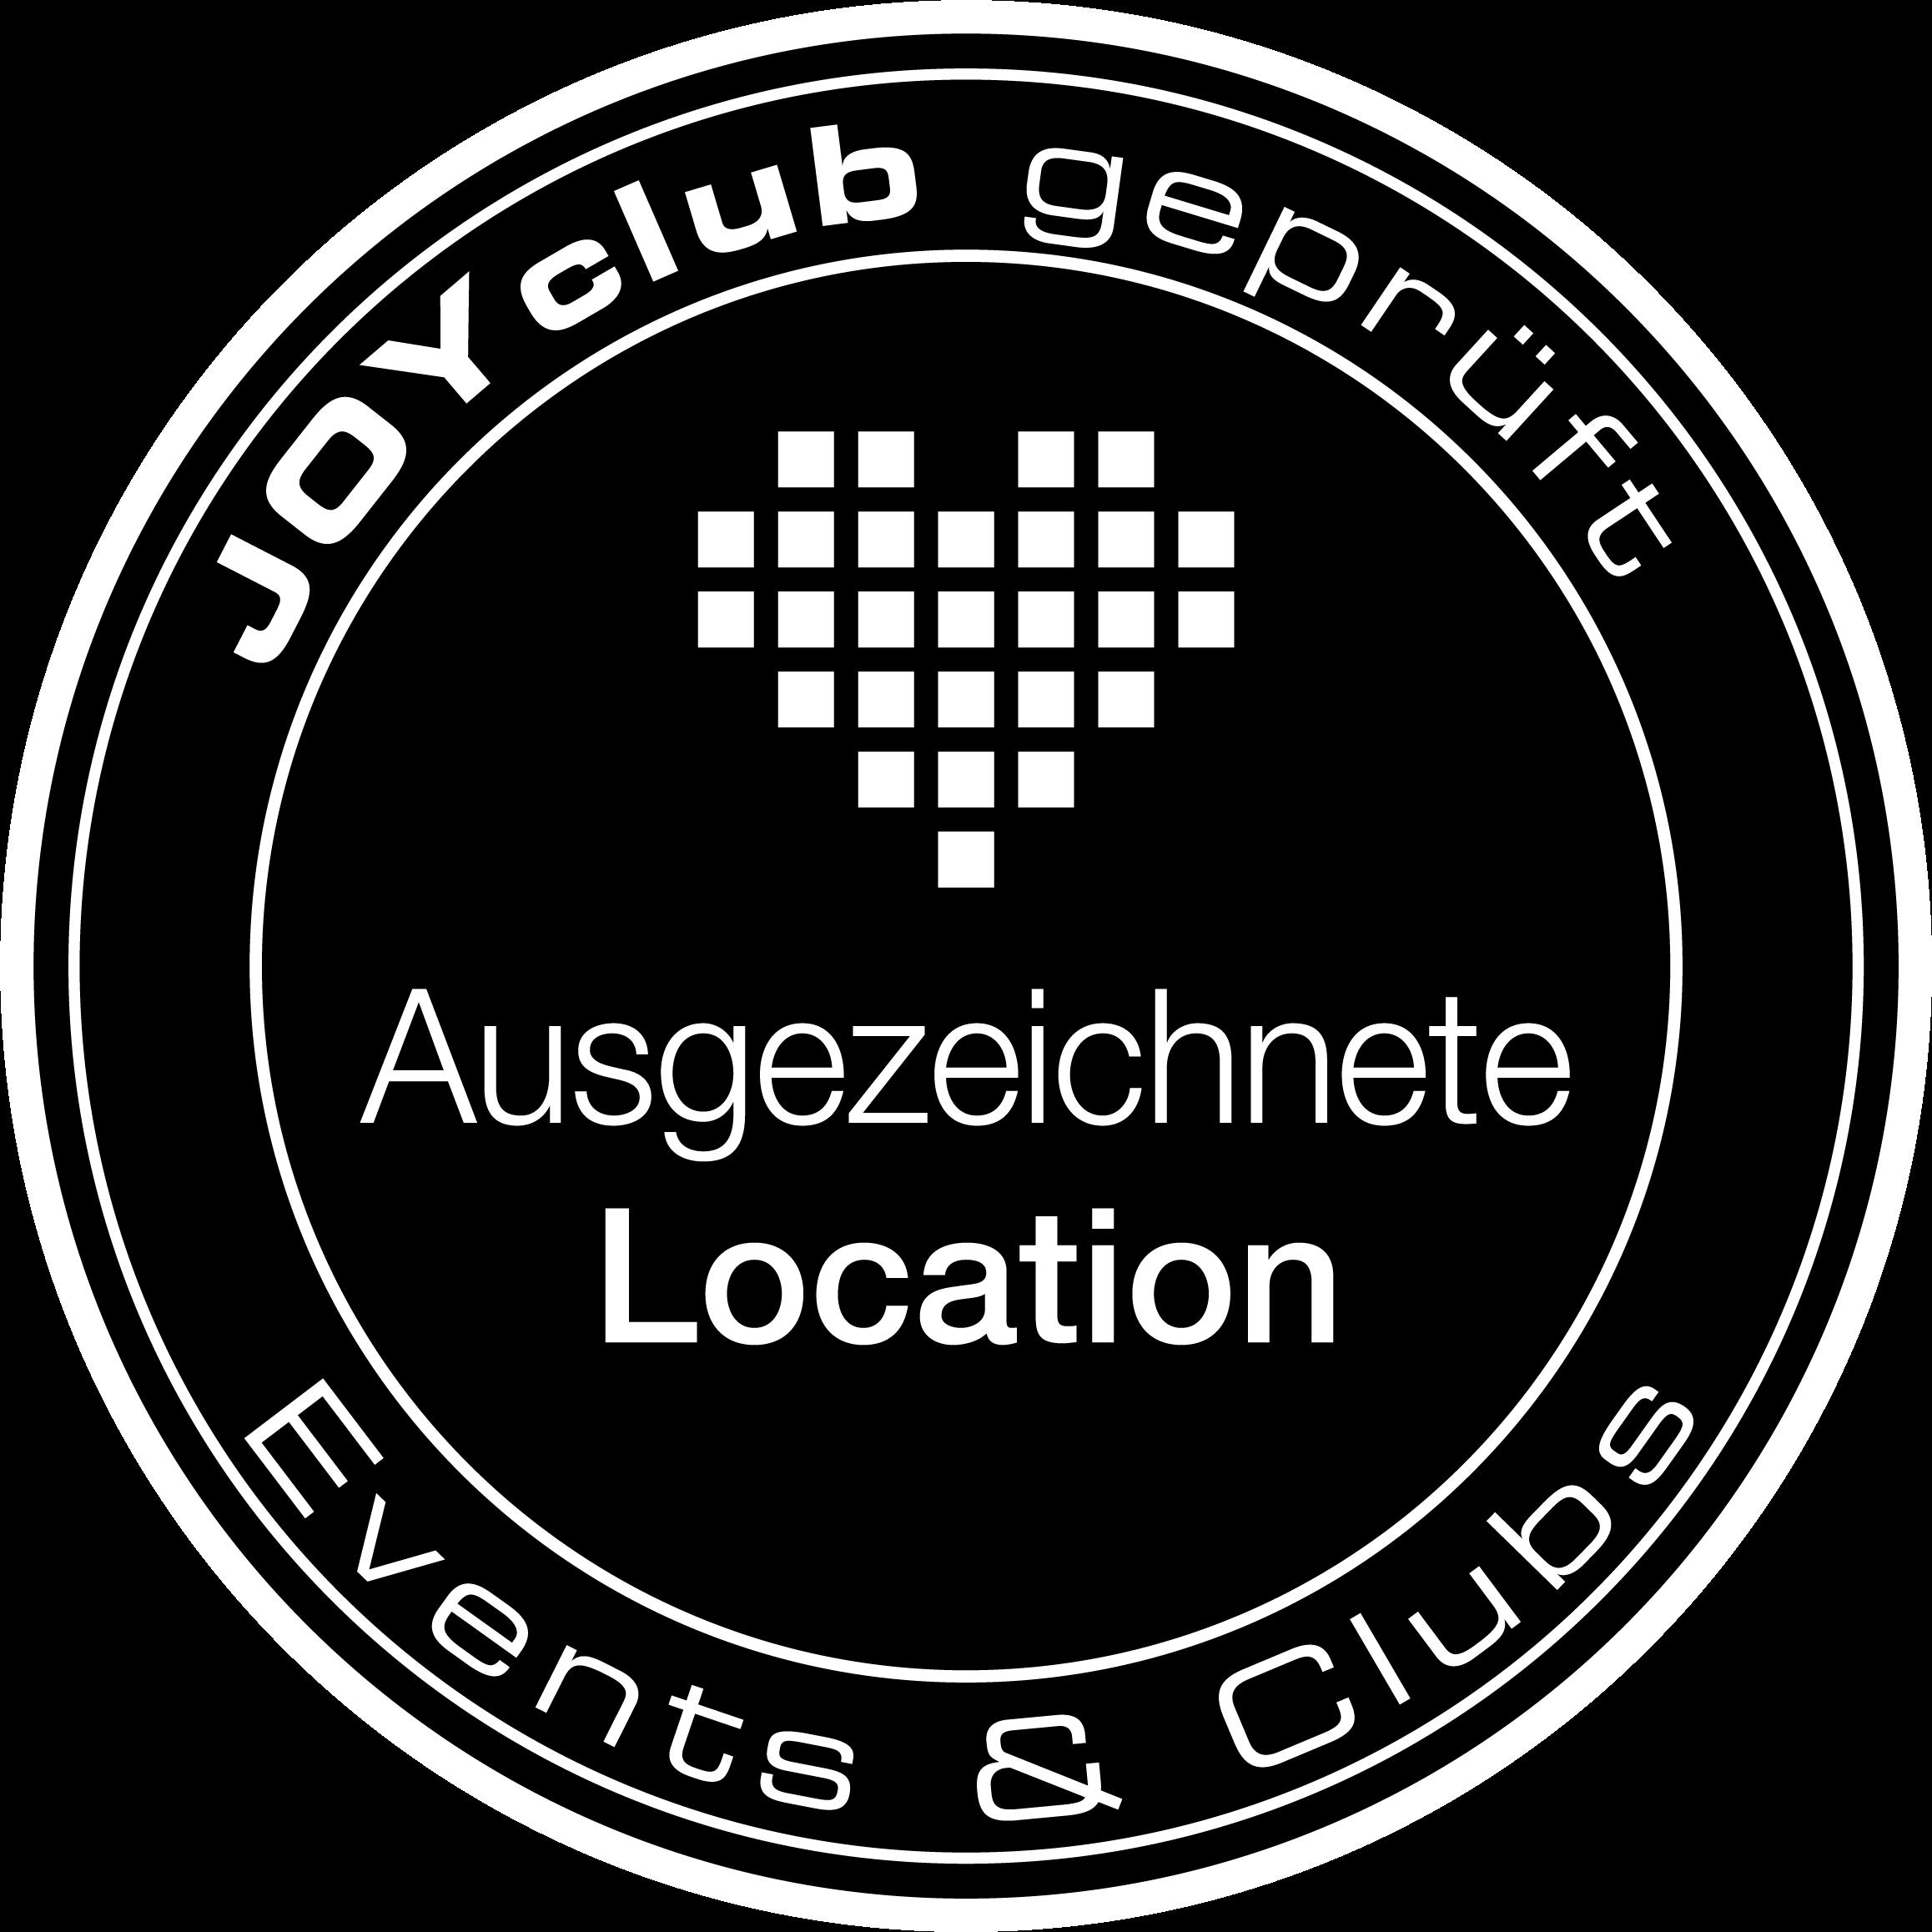 JOYclub-Siegel